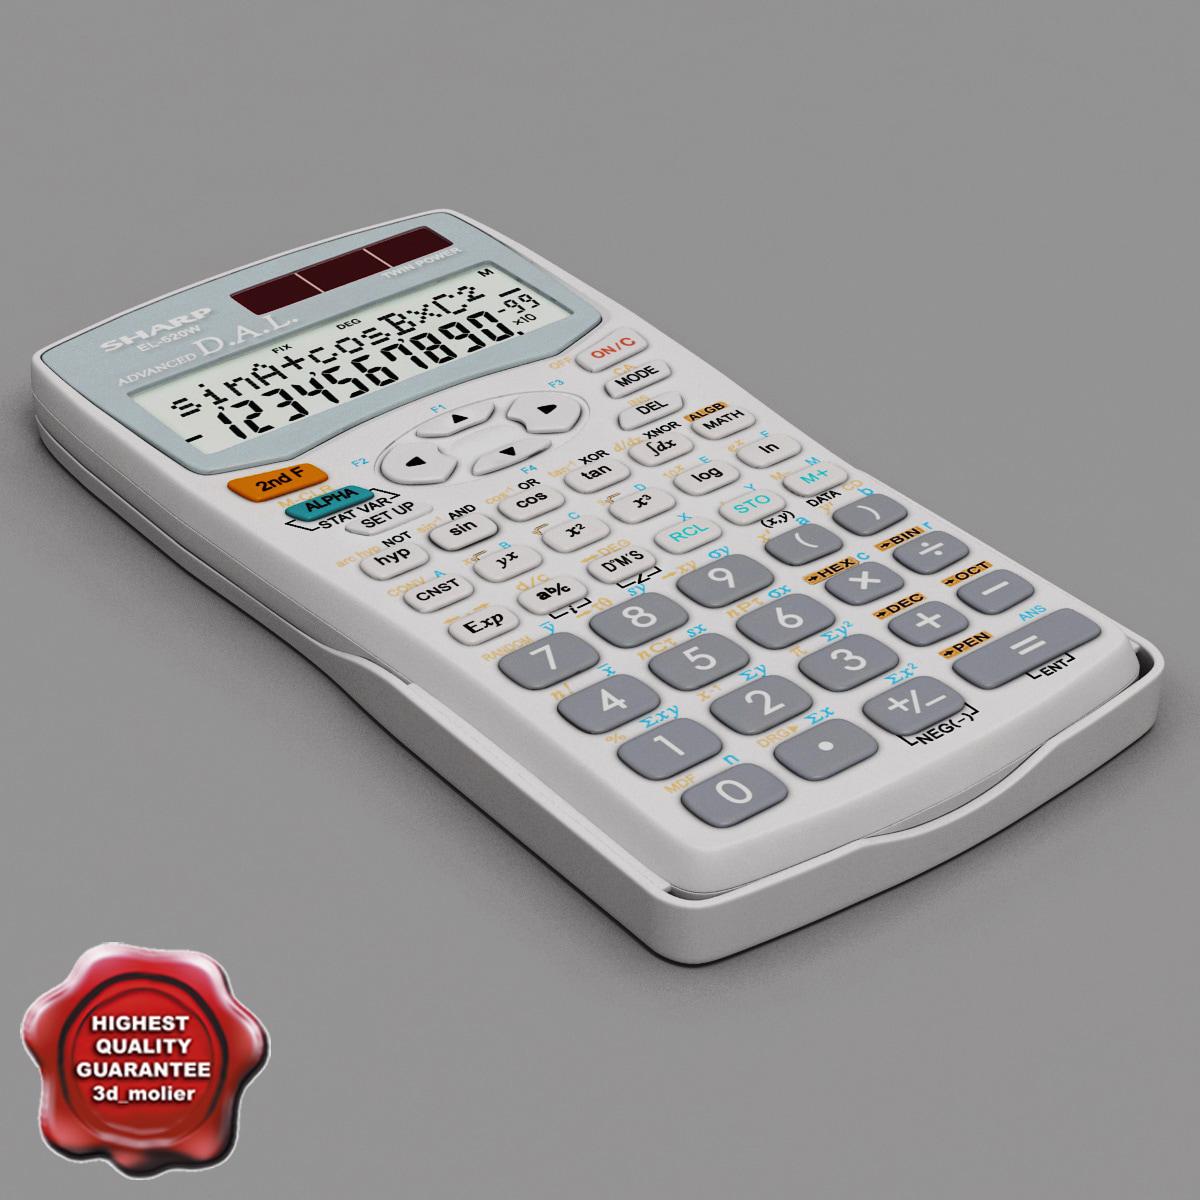 Calculator_Sharp_EL-520w_White_00.jpg